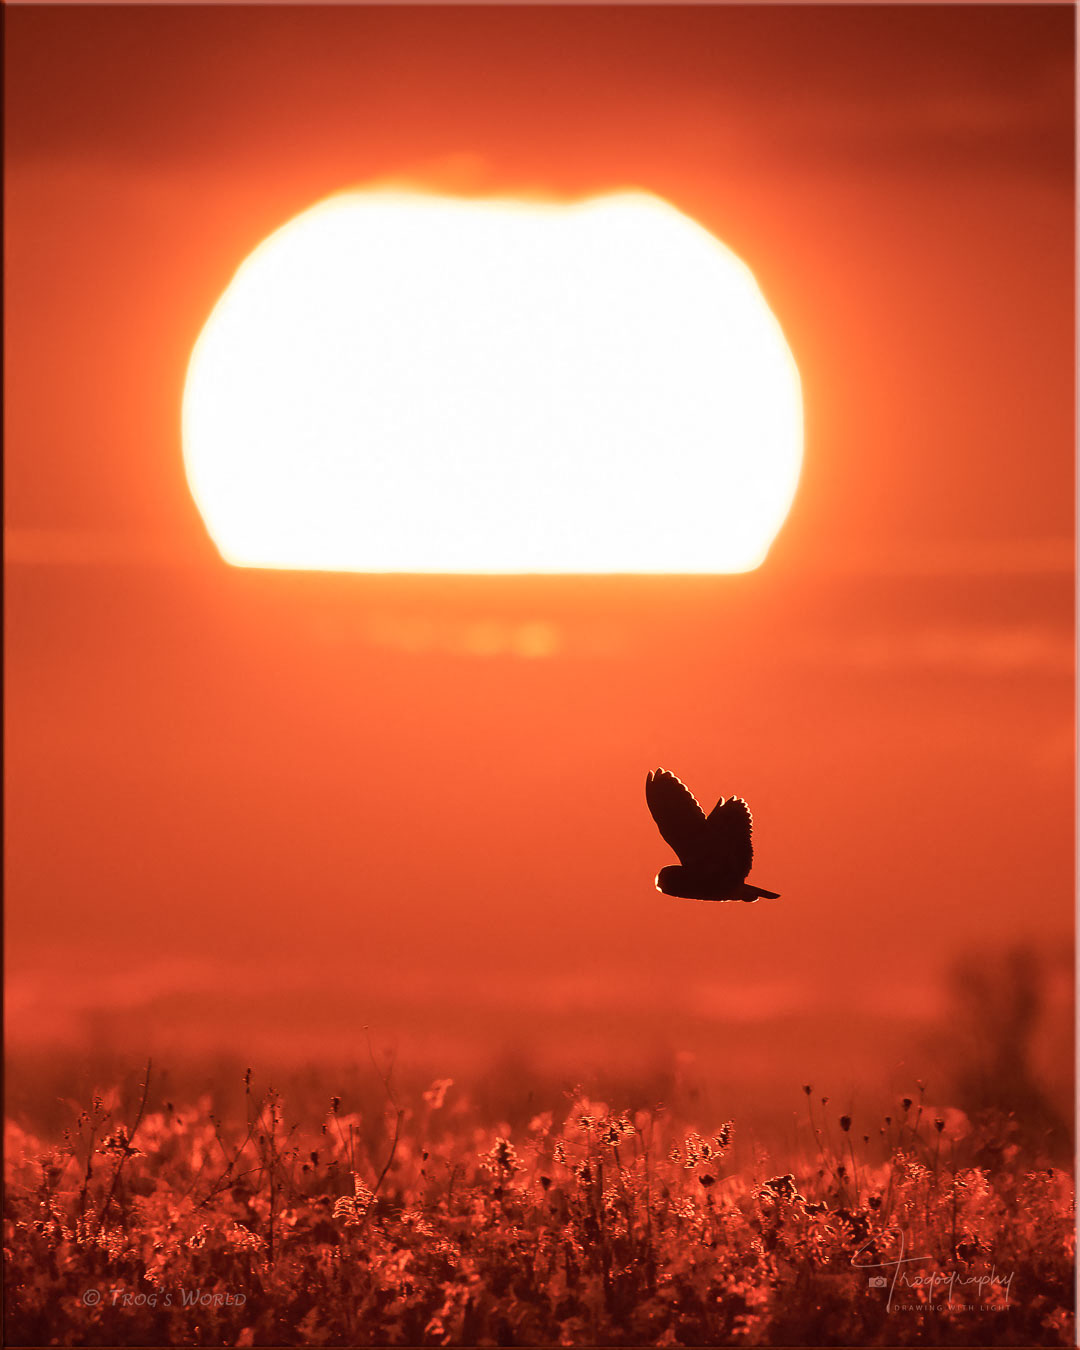 Short-eared Owl in flight at sunset